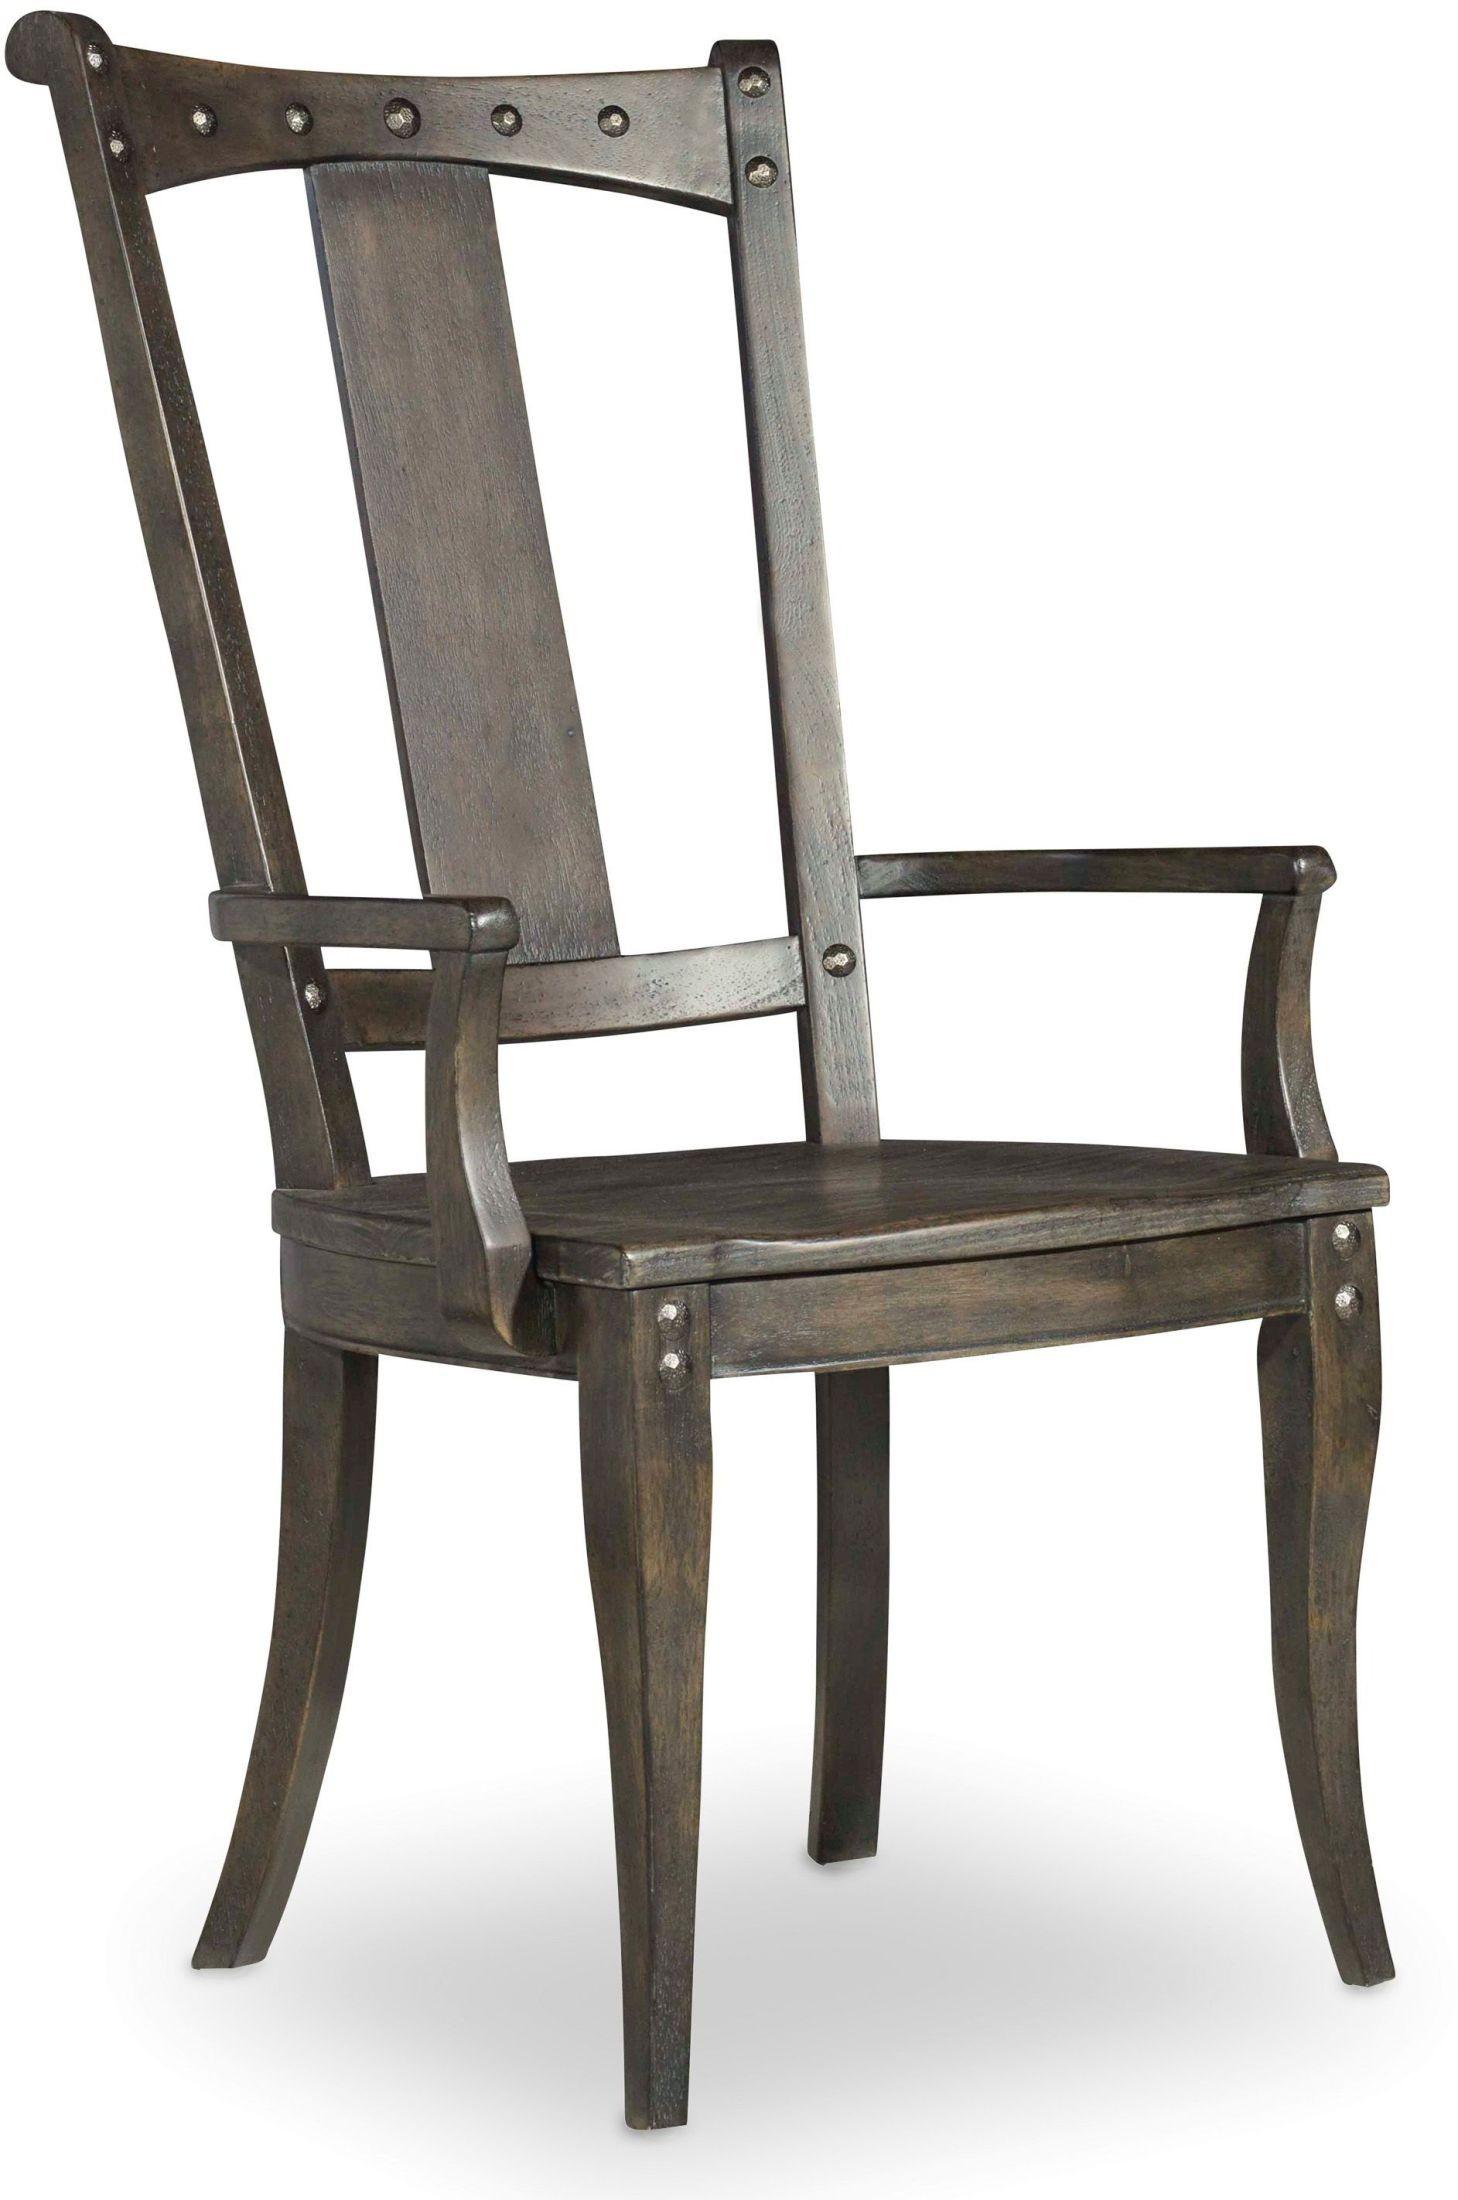 Vintage West Charcoal Gray Splatback Arm Chair Set Of 2 5700 75300 Hooker F